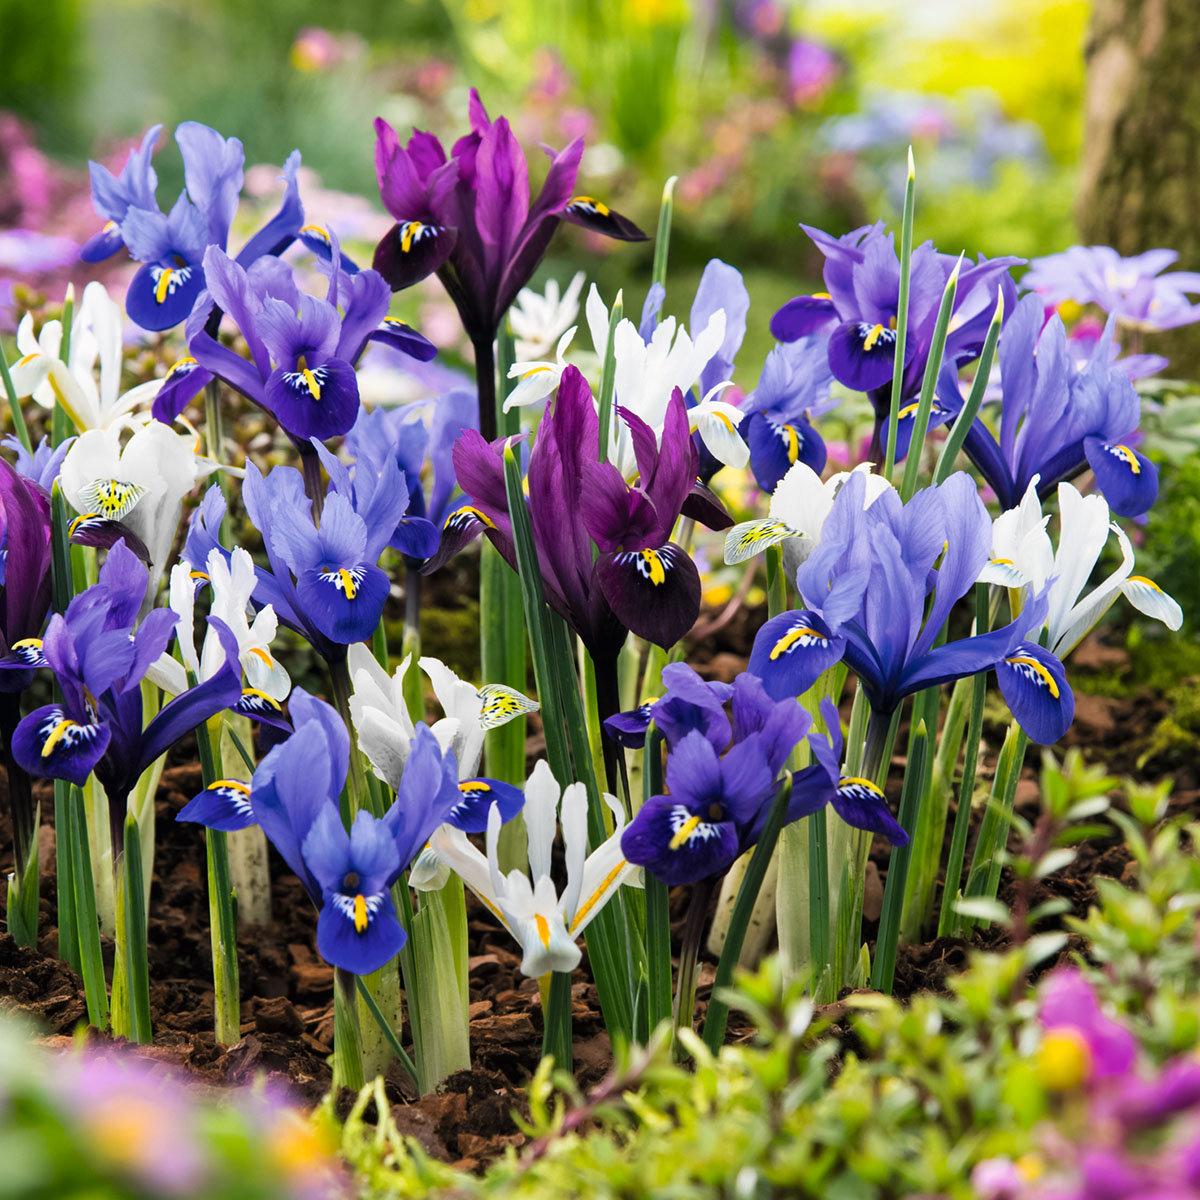 Frühlings-Zwerg-Iris-Mischung